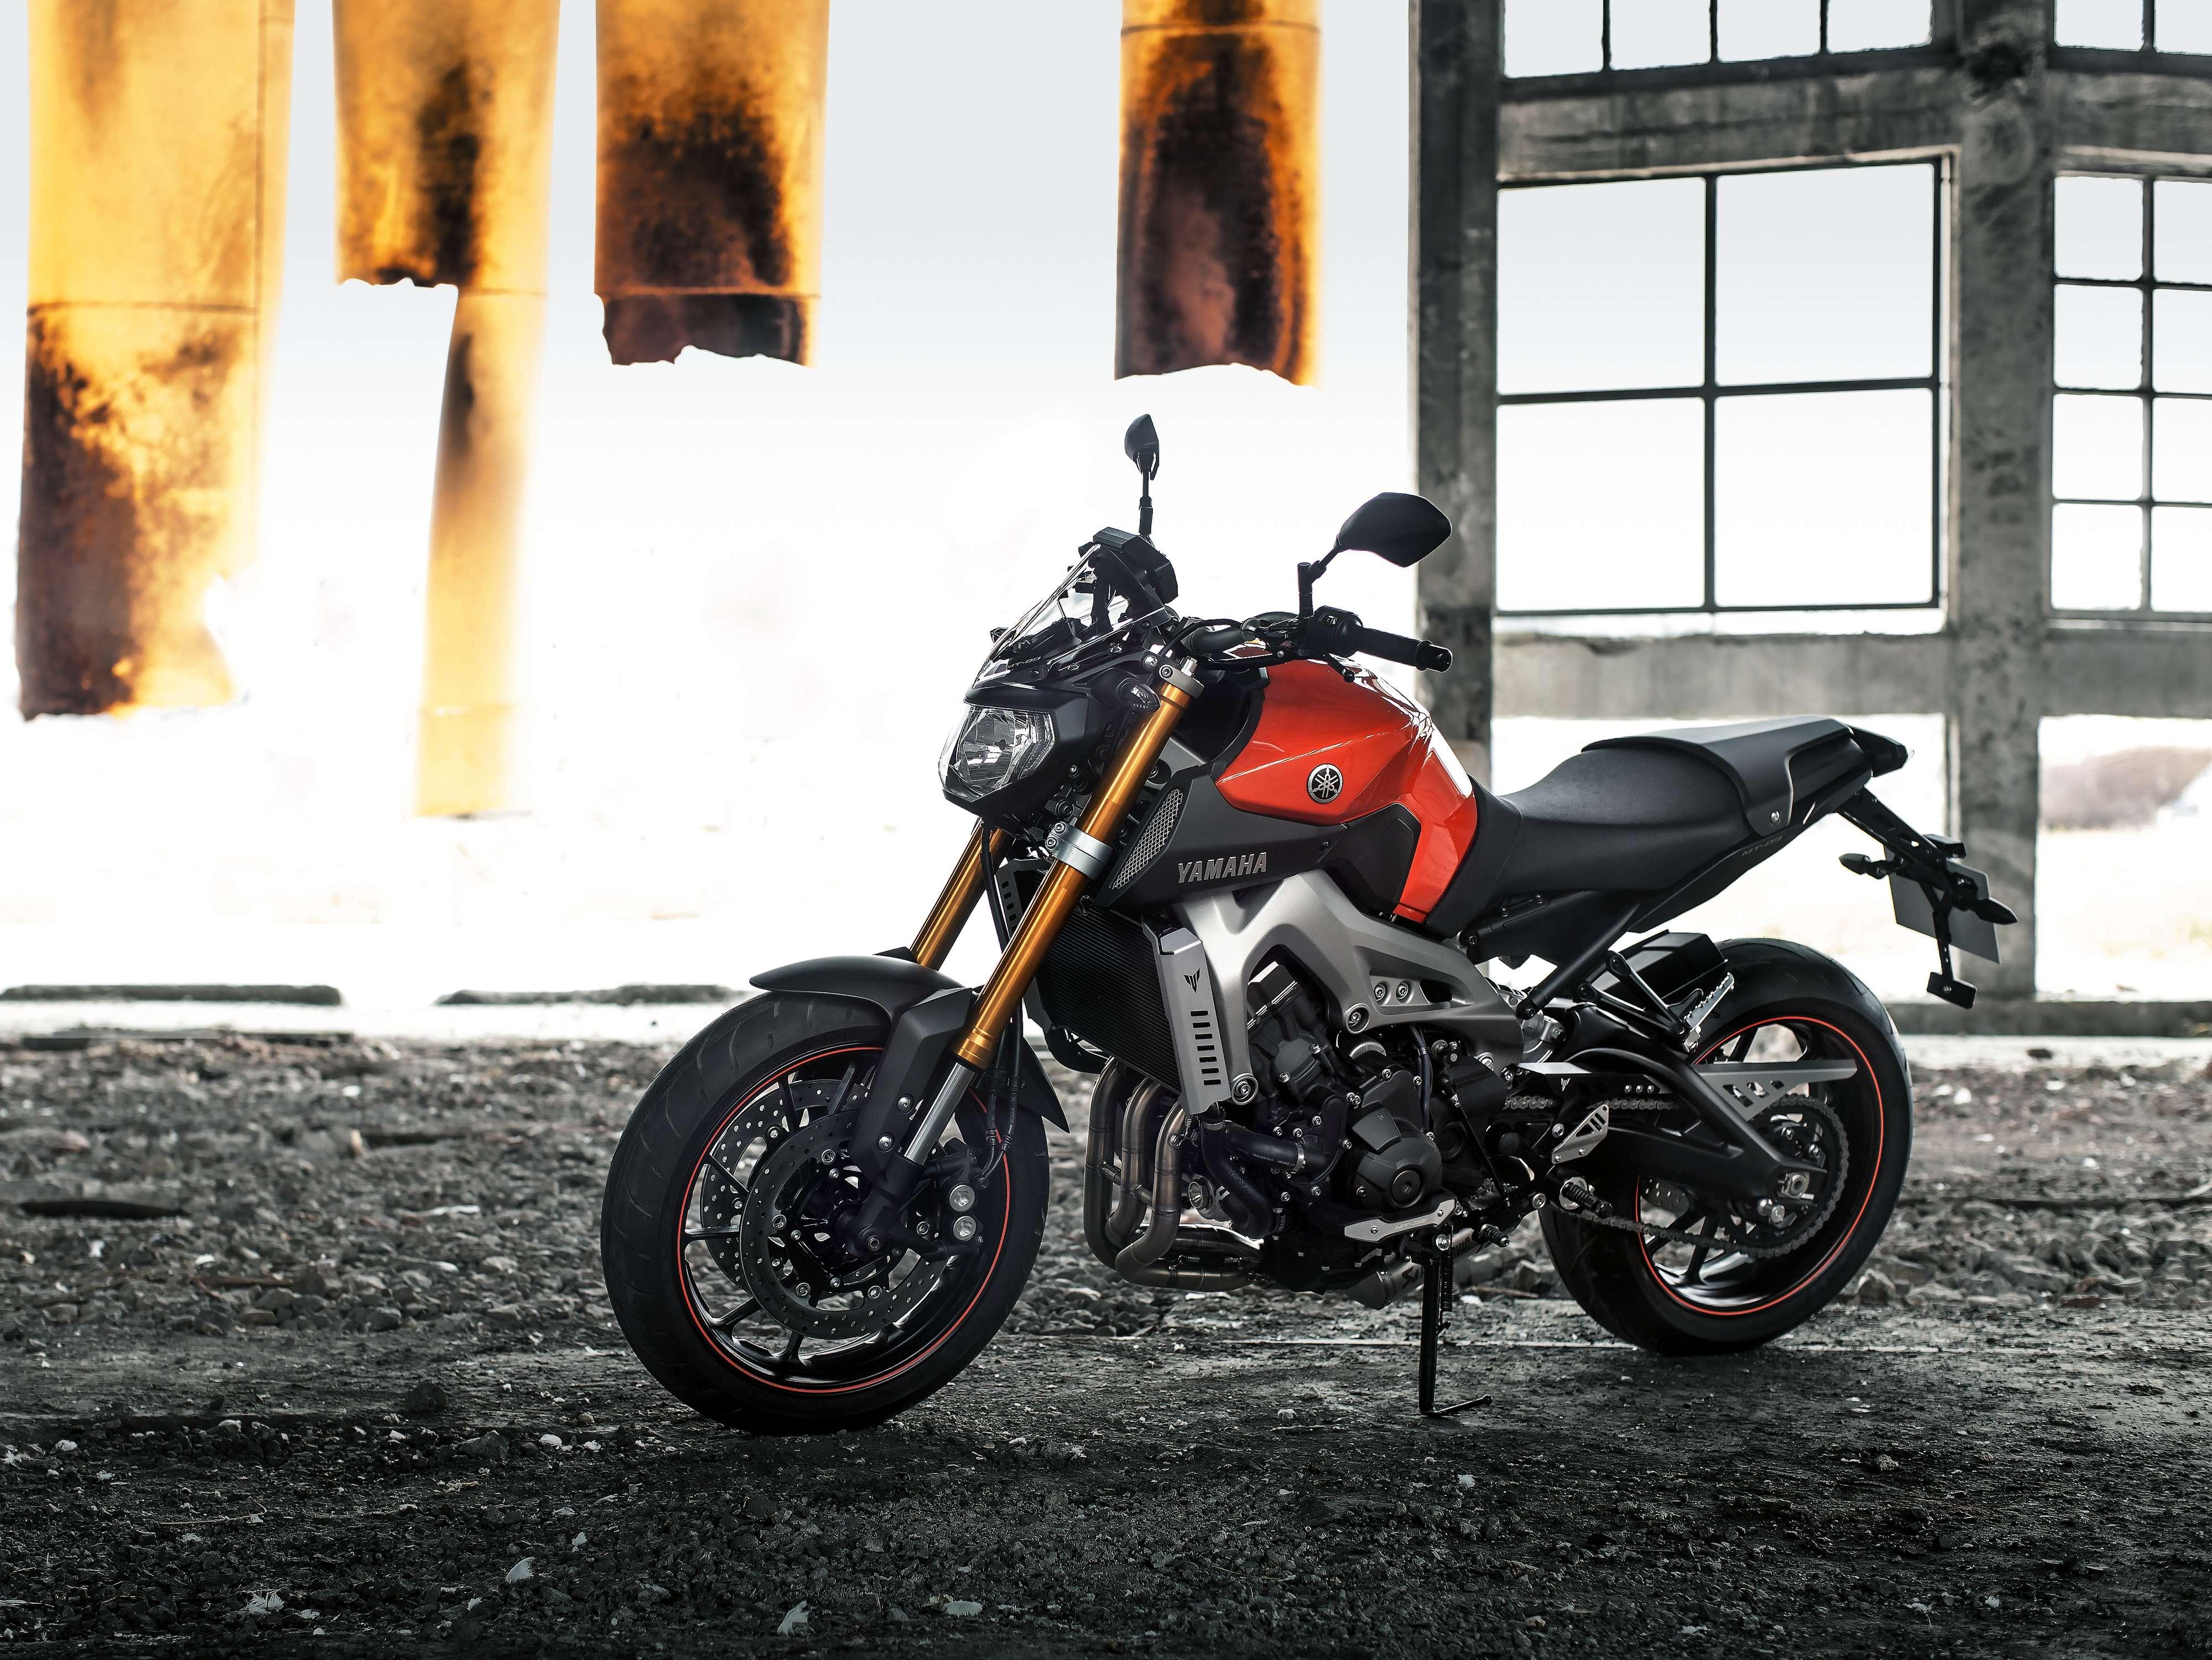 Yamaha MT-09 Foto: Yamaha/Divulgação